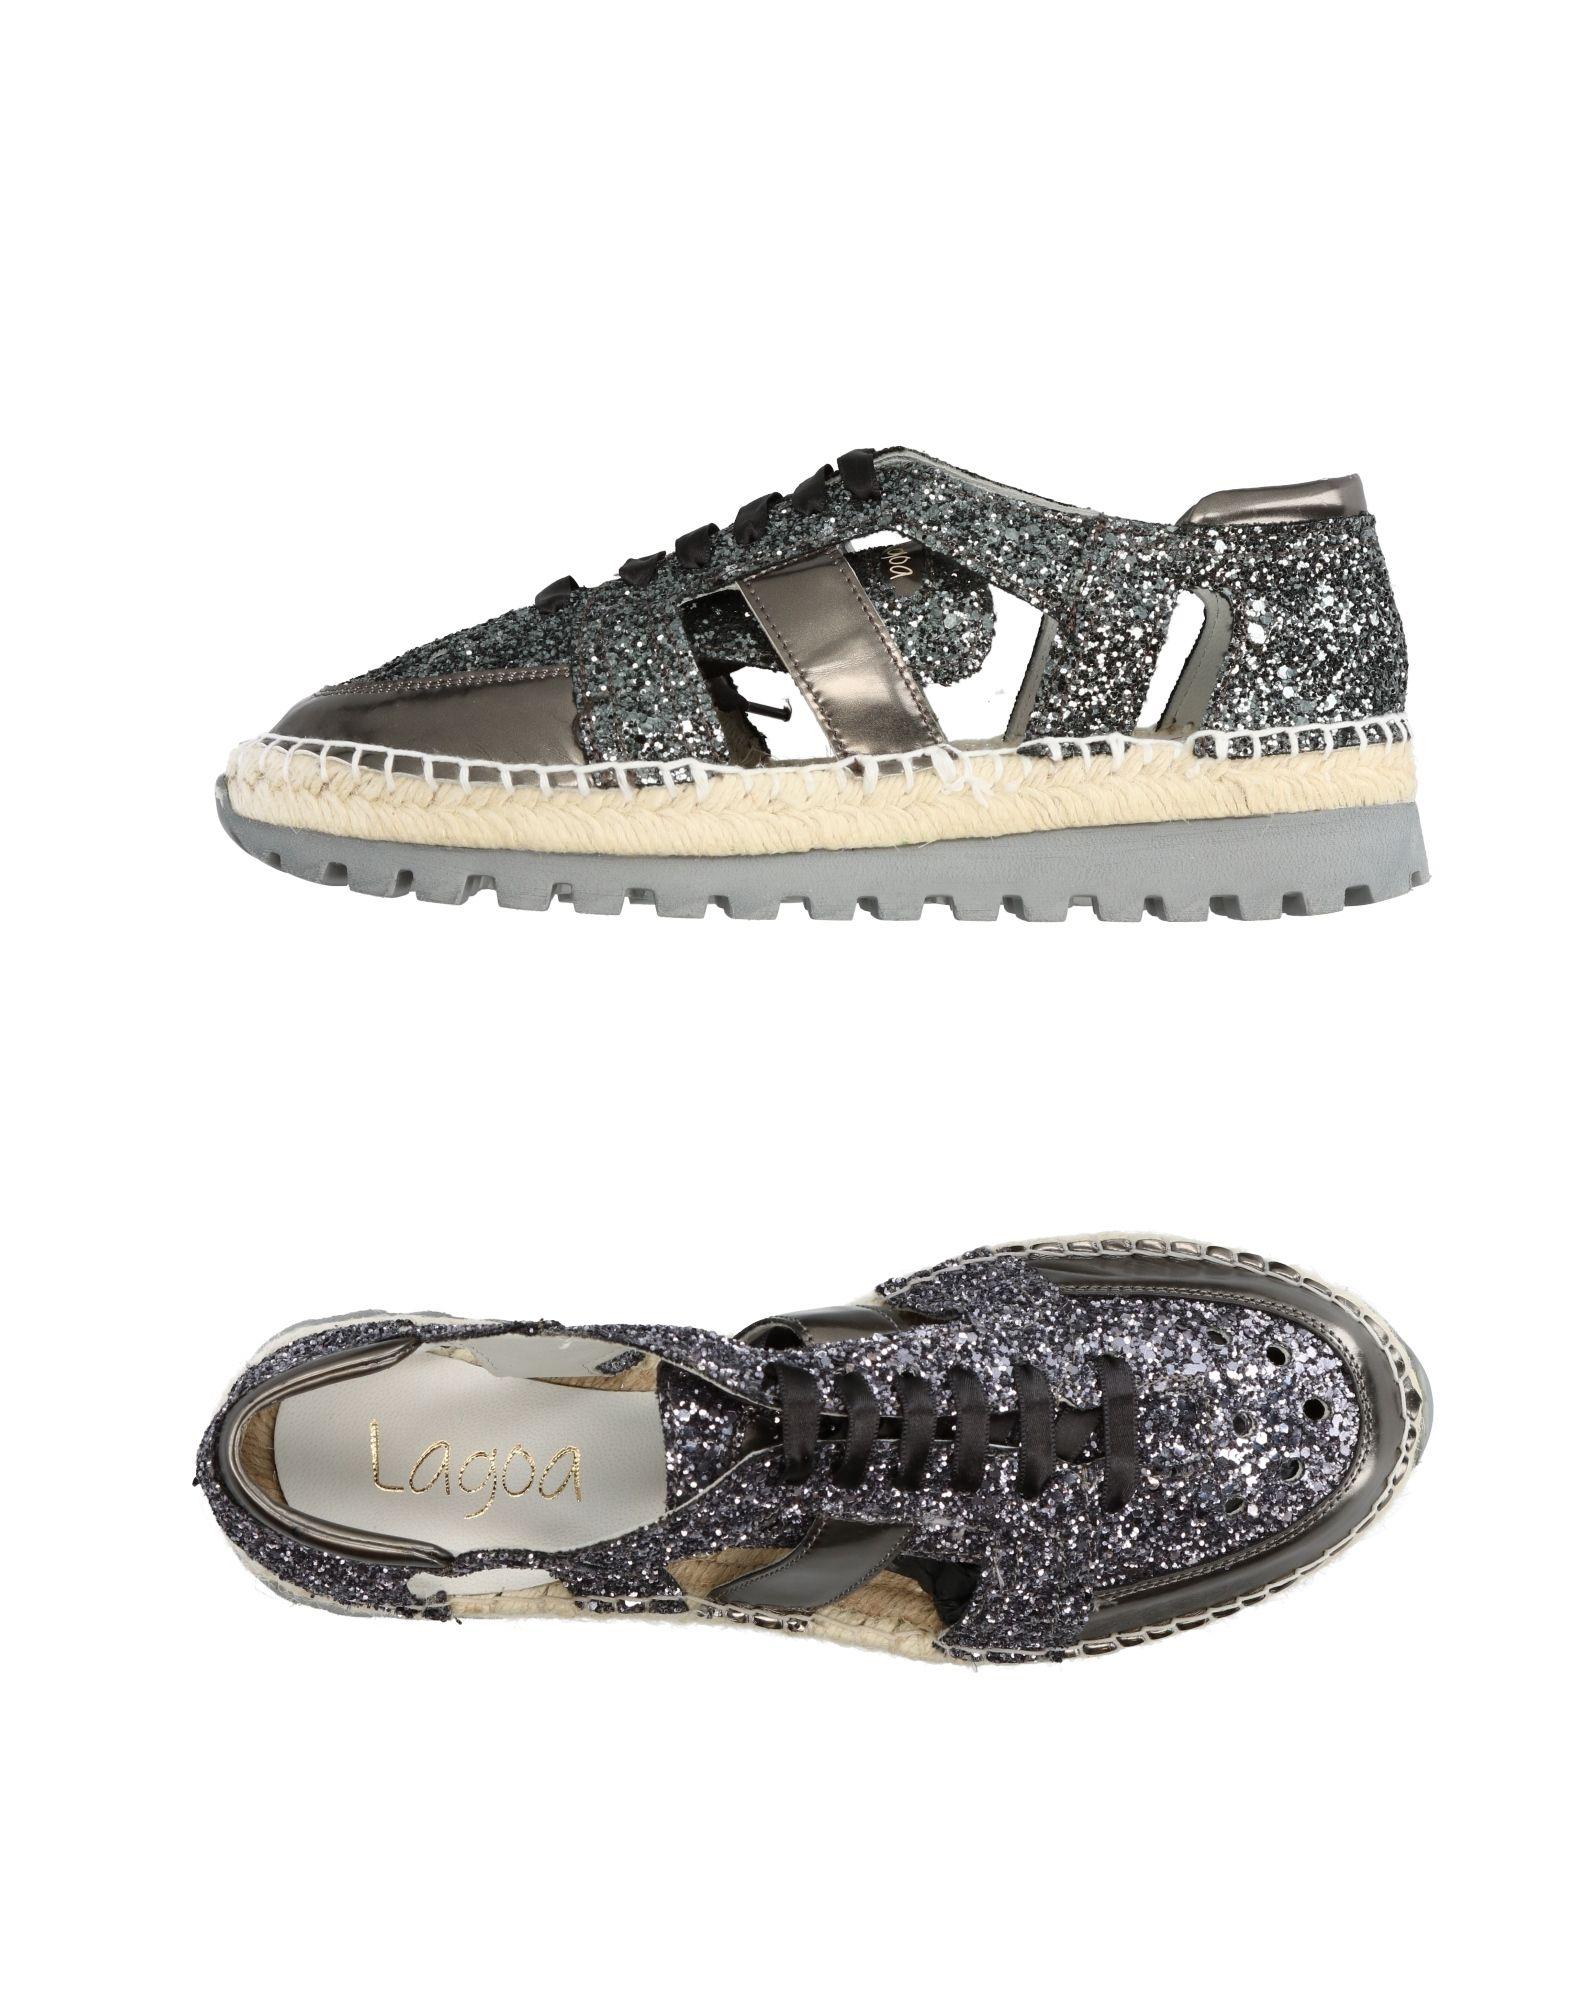 Lagoa Gute Sandalen Damen  11262038TU Gute Lagoa Qualität beliebte Schuhe fe5aed